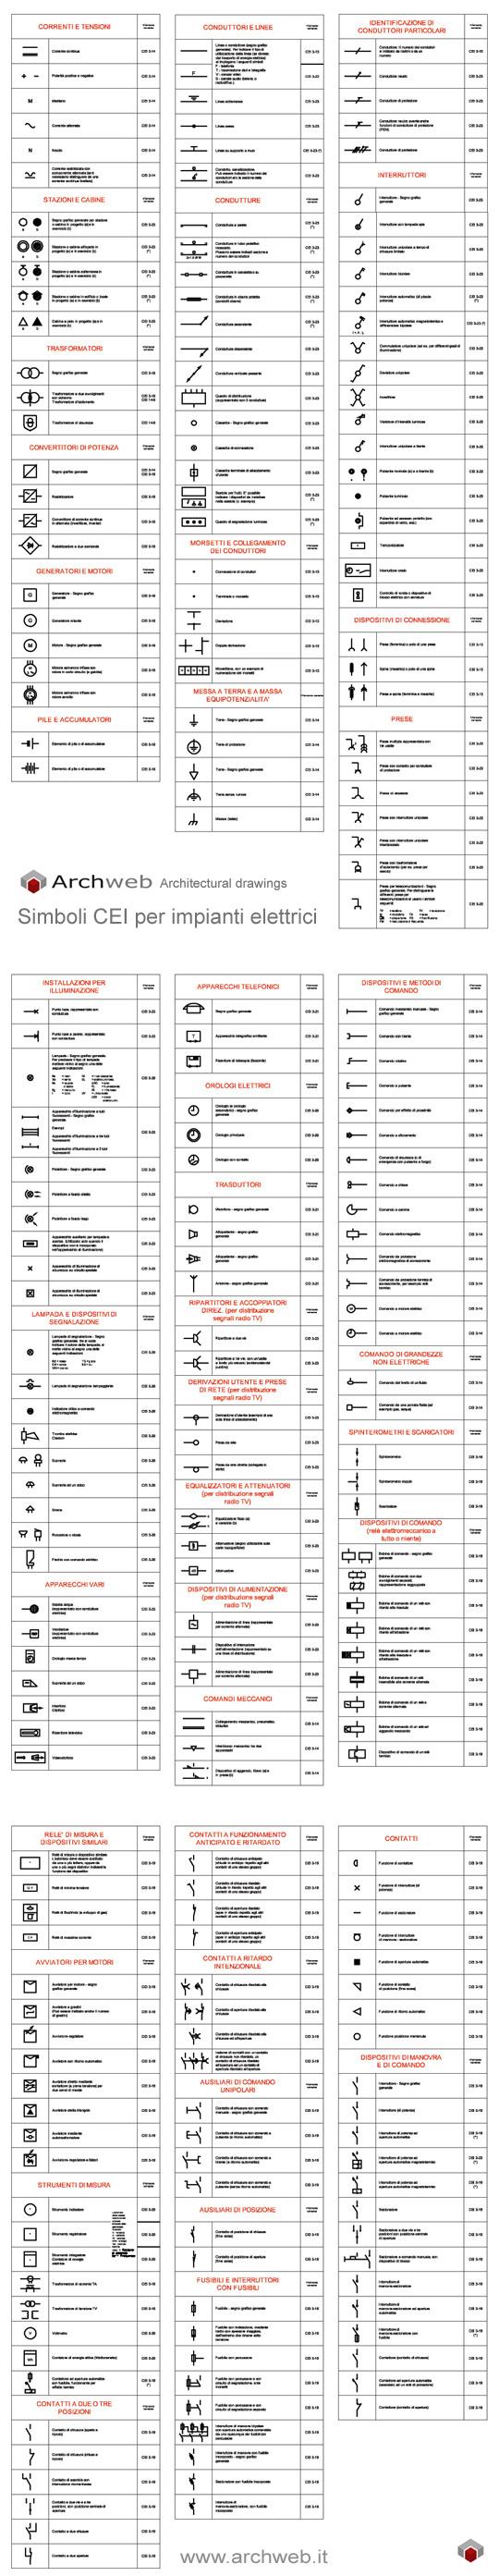 Legenda Schemi Elettrici : Simboli cei per impianti elettrici